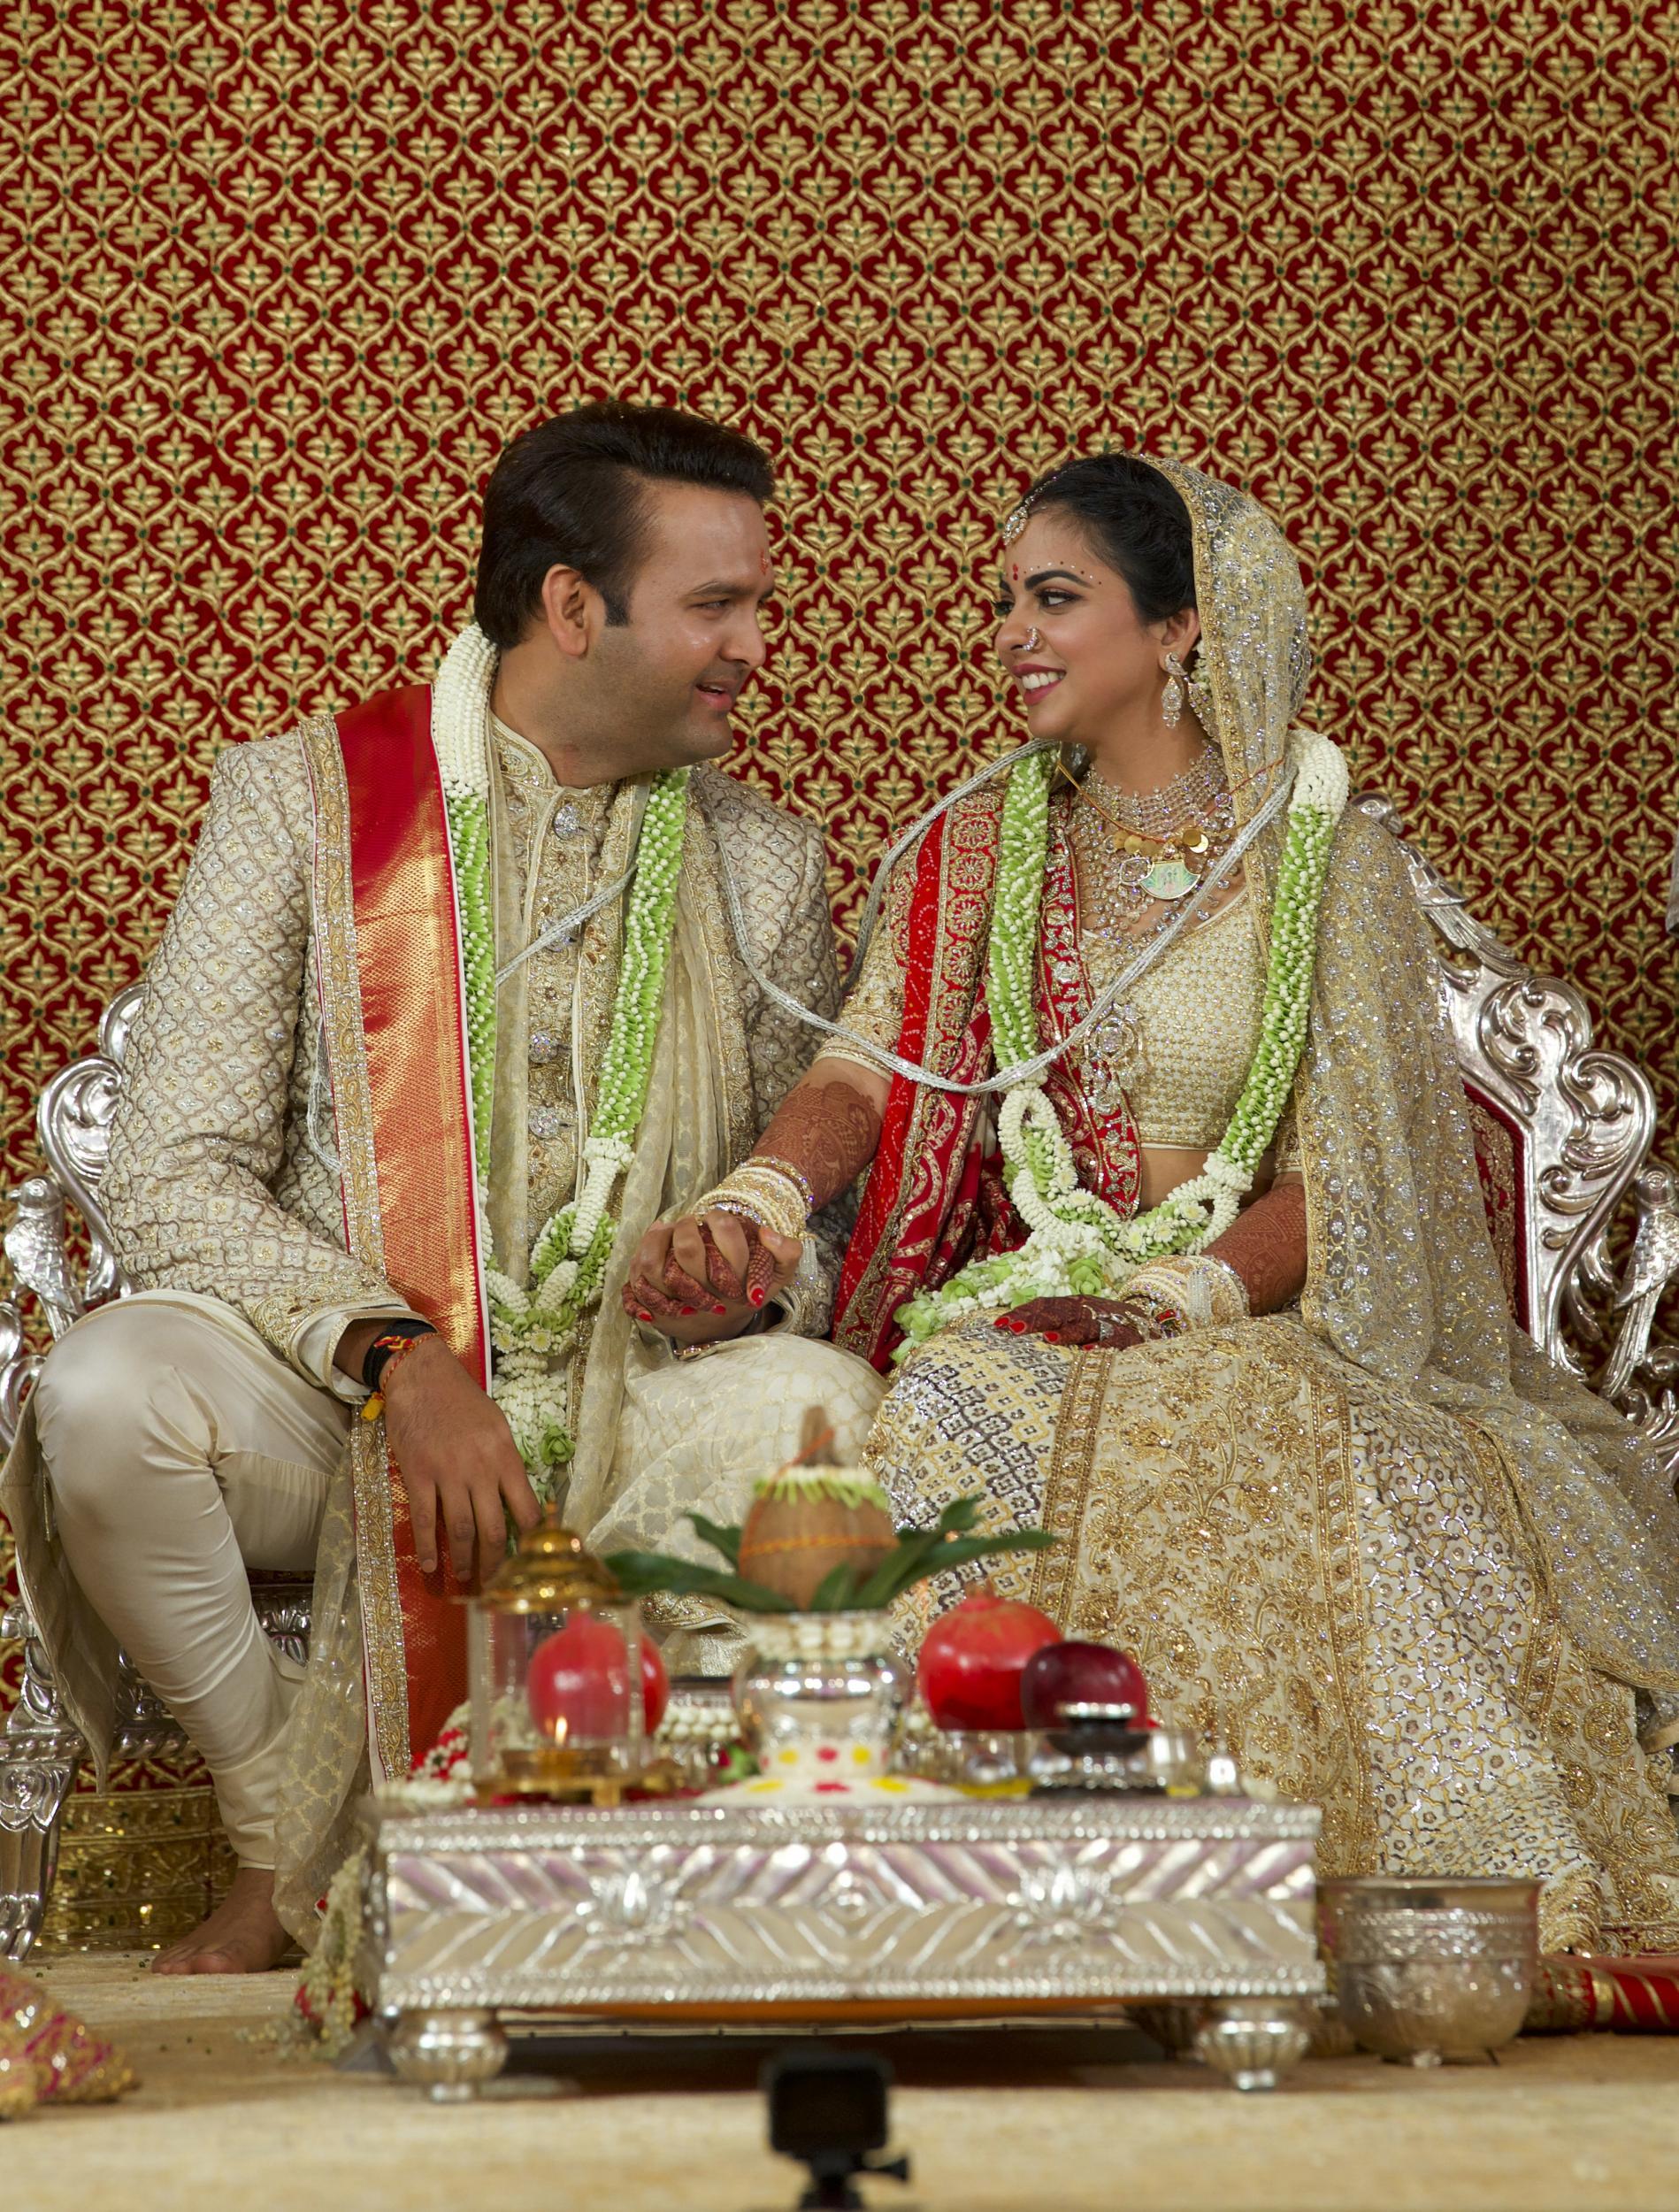 PunjabKesari, Nari, Isha Ambani wedding image